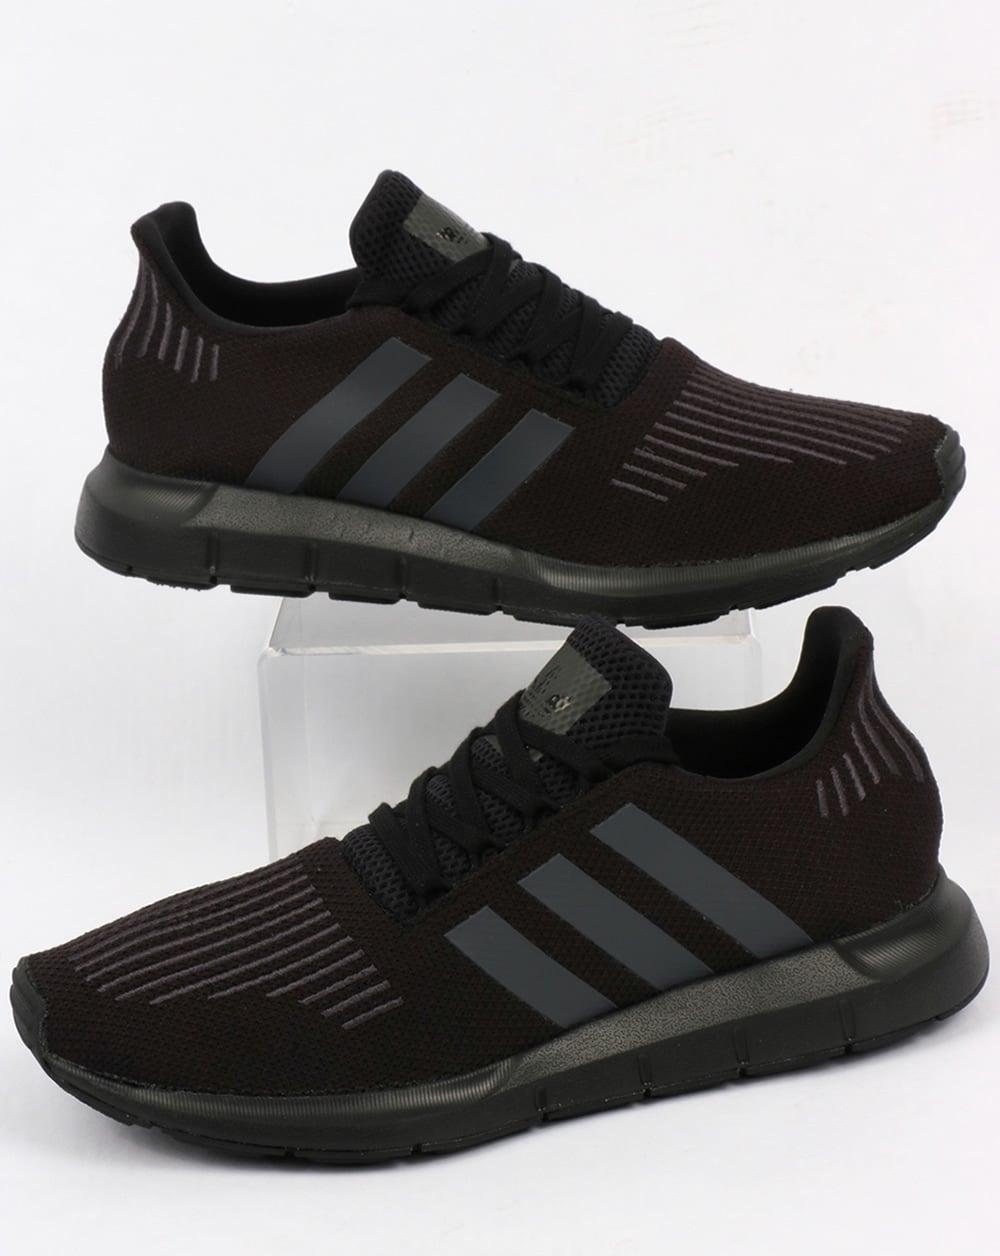 38ce9e14cf2d2f adidas Trainers Adidas Swift Run Trainers Black